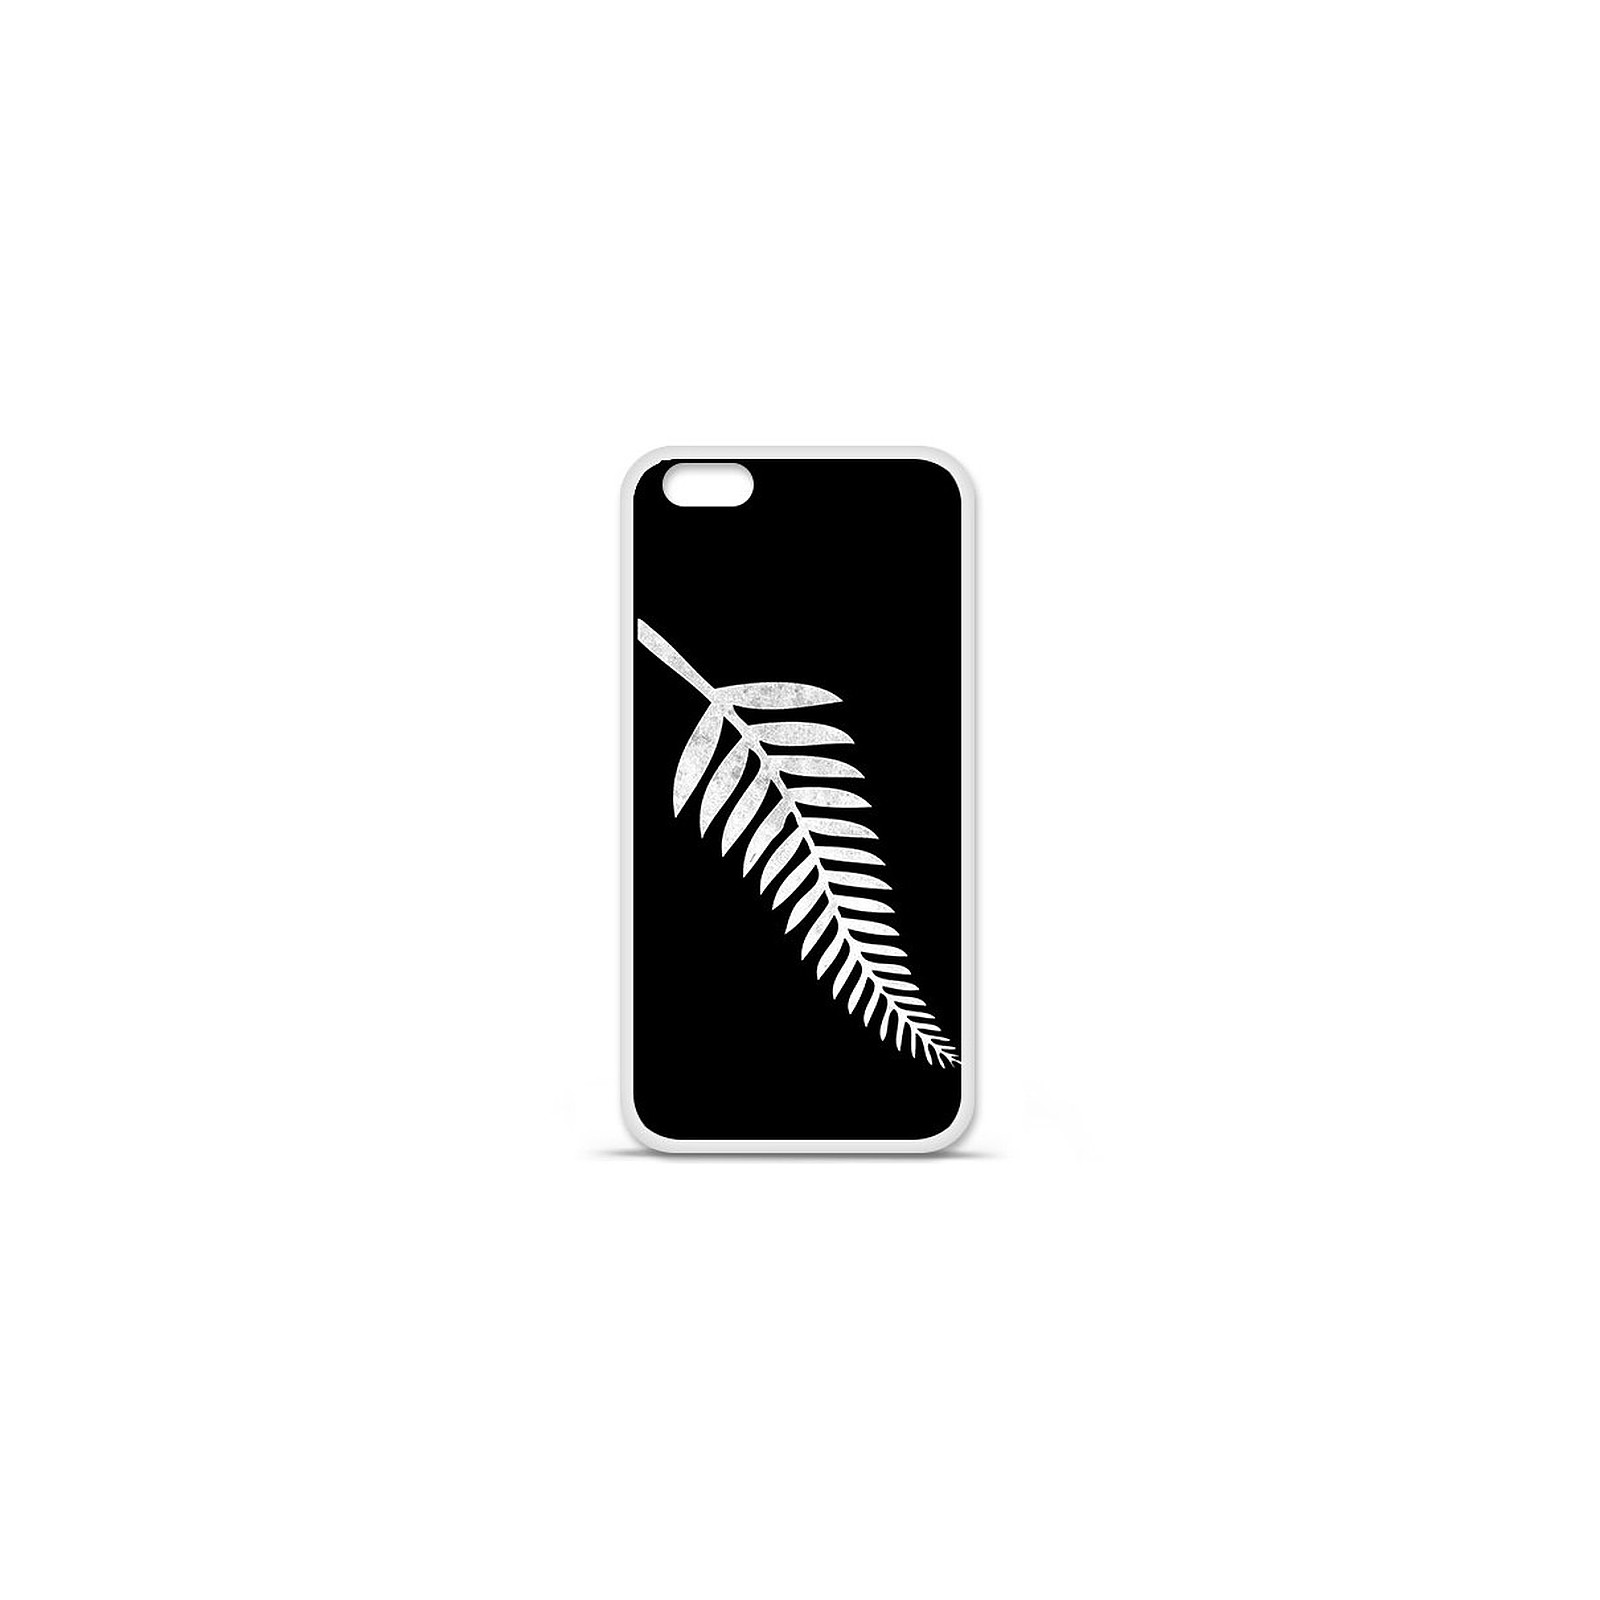 1001 Coques Coque silicone gel Apple IPhone 7 Plus motif Drapeau All-black